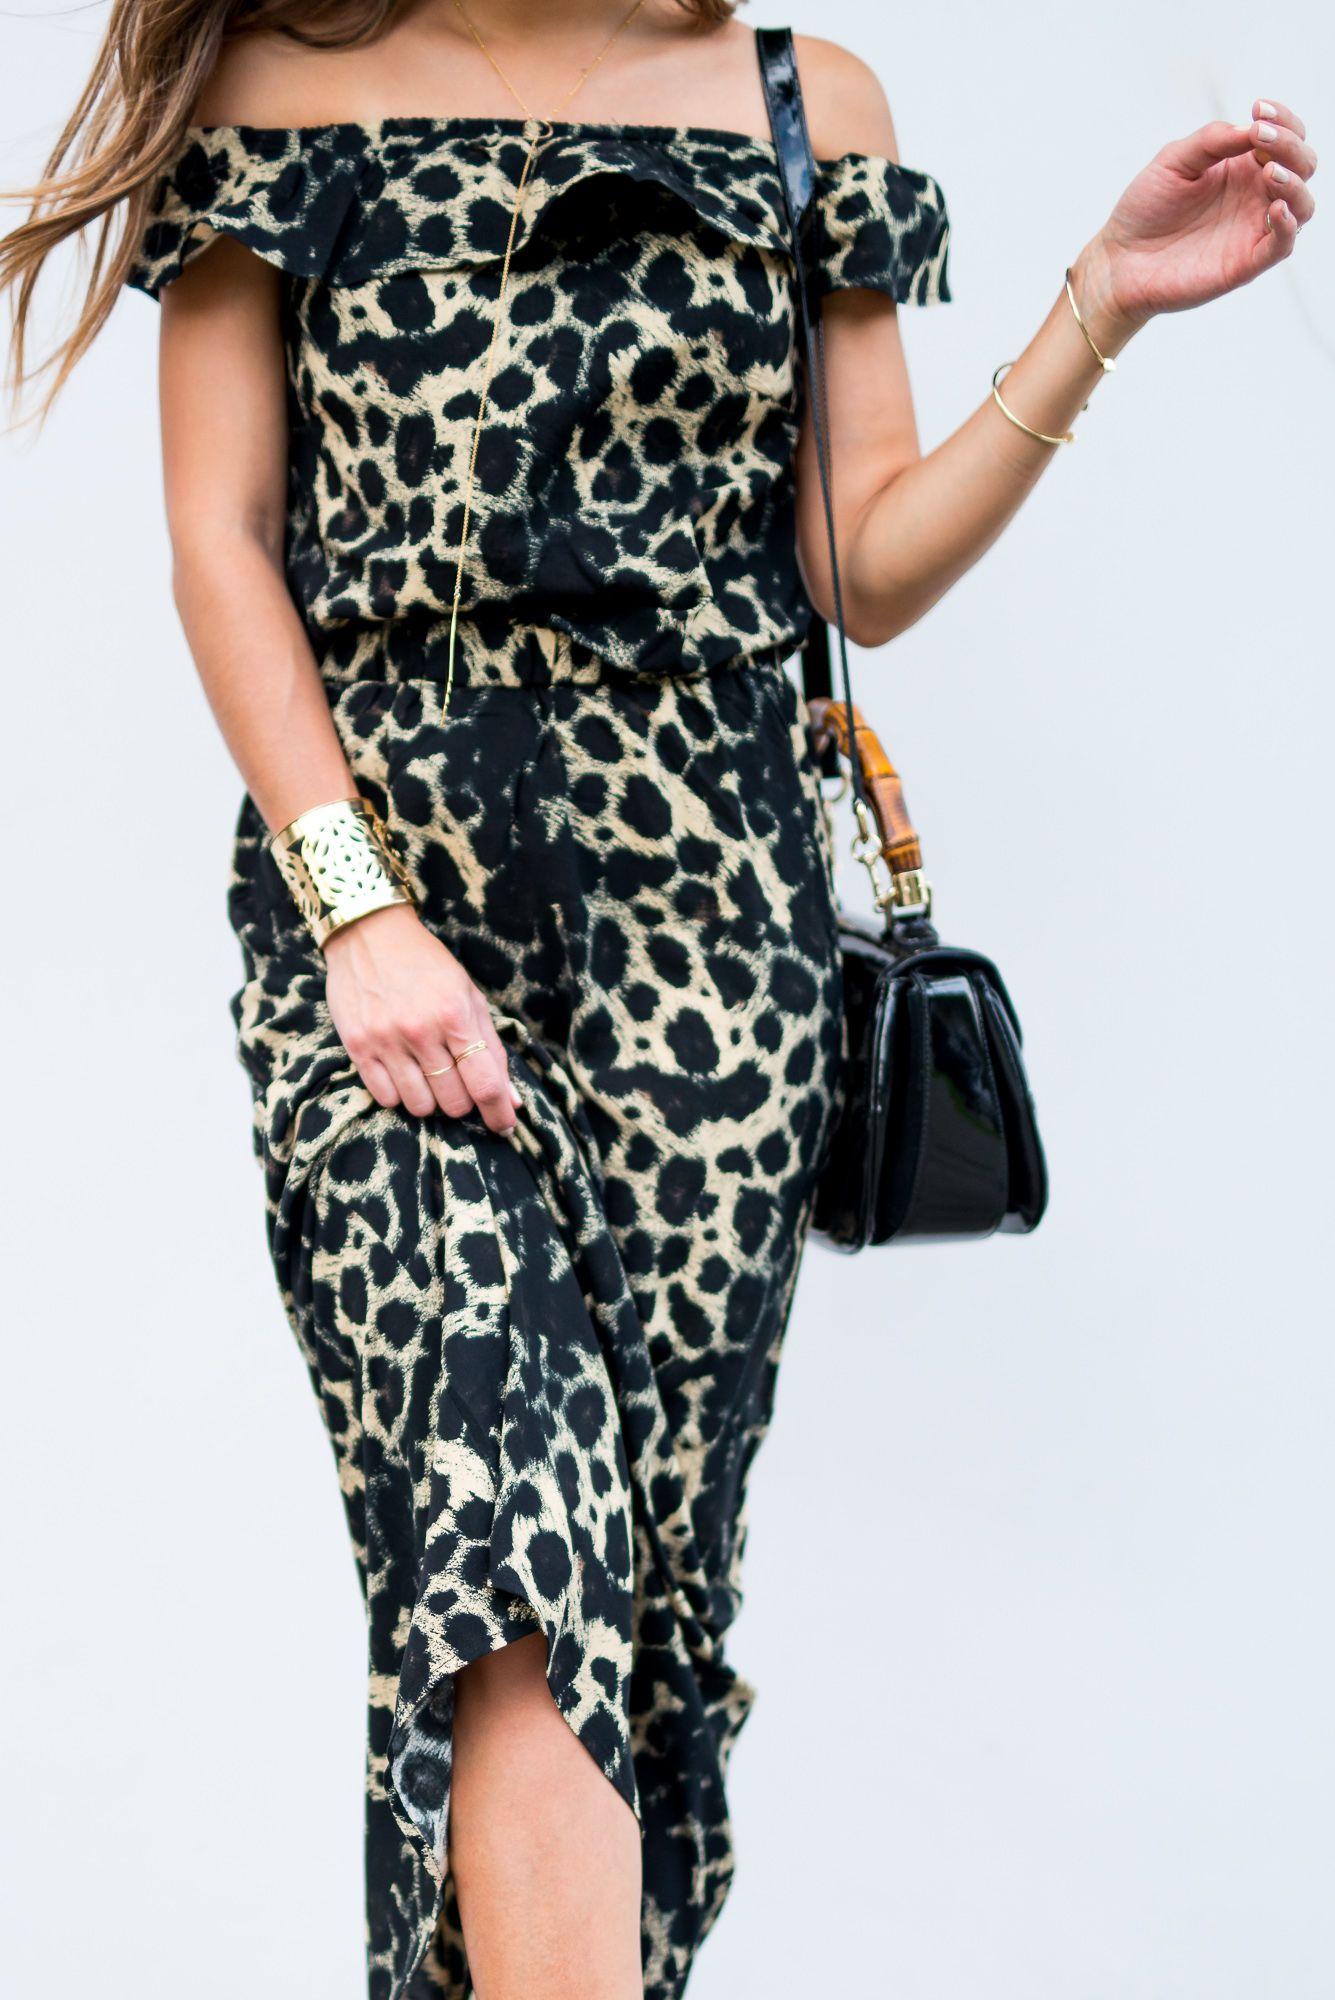 b216b1ecb71b Vero Moda -Leopard -Print -Off -The- Shoulder -Maxi-Dress-Valentino-Rockstud-Sandals-  Gucci-Bamboo Bag - Pam- Hetlinger- The- Girl - From- Panama